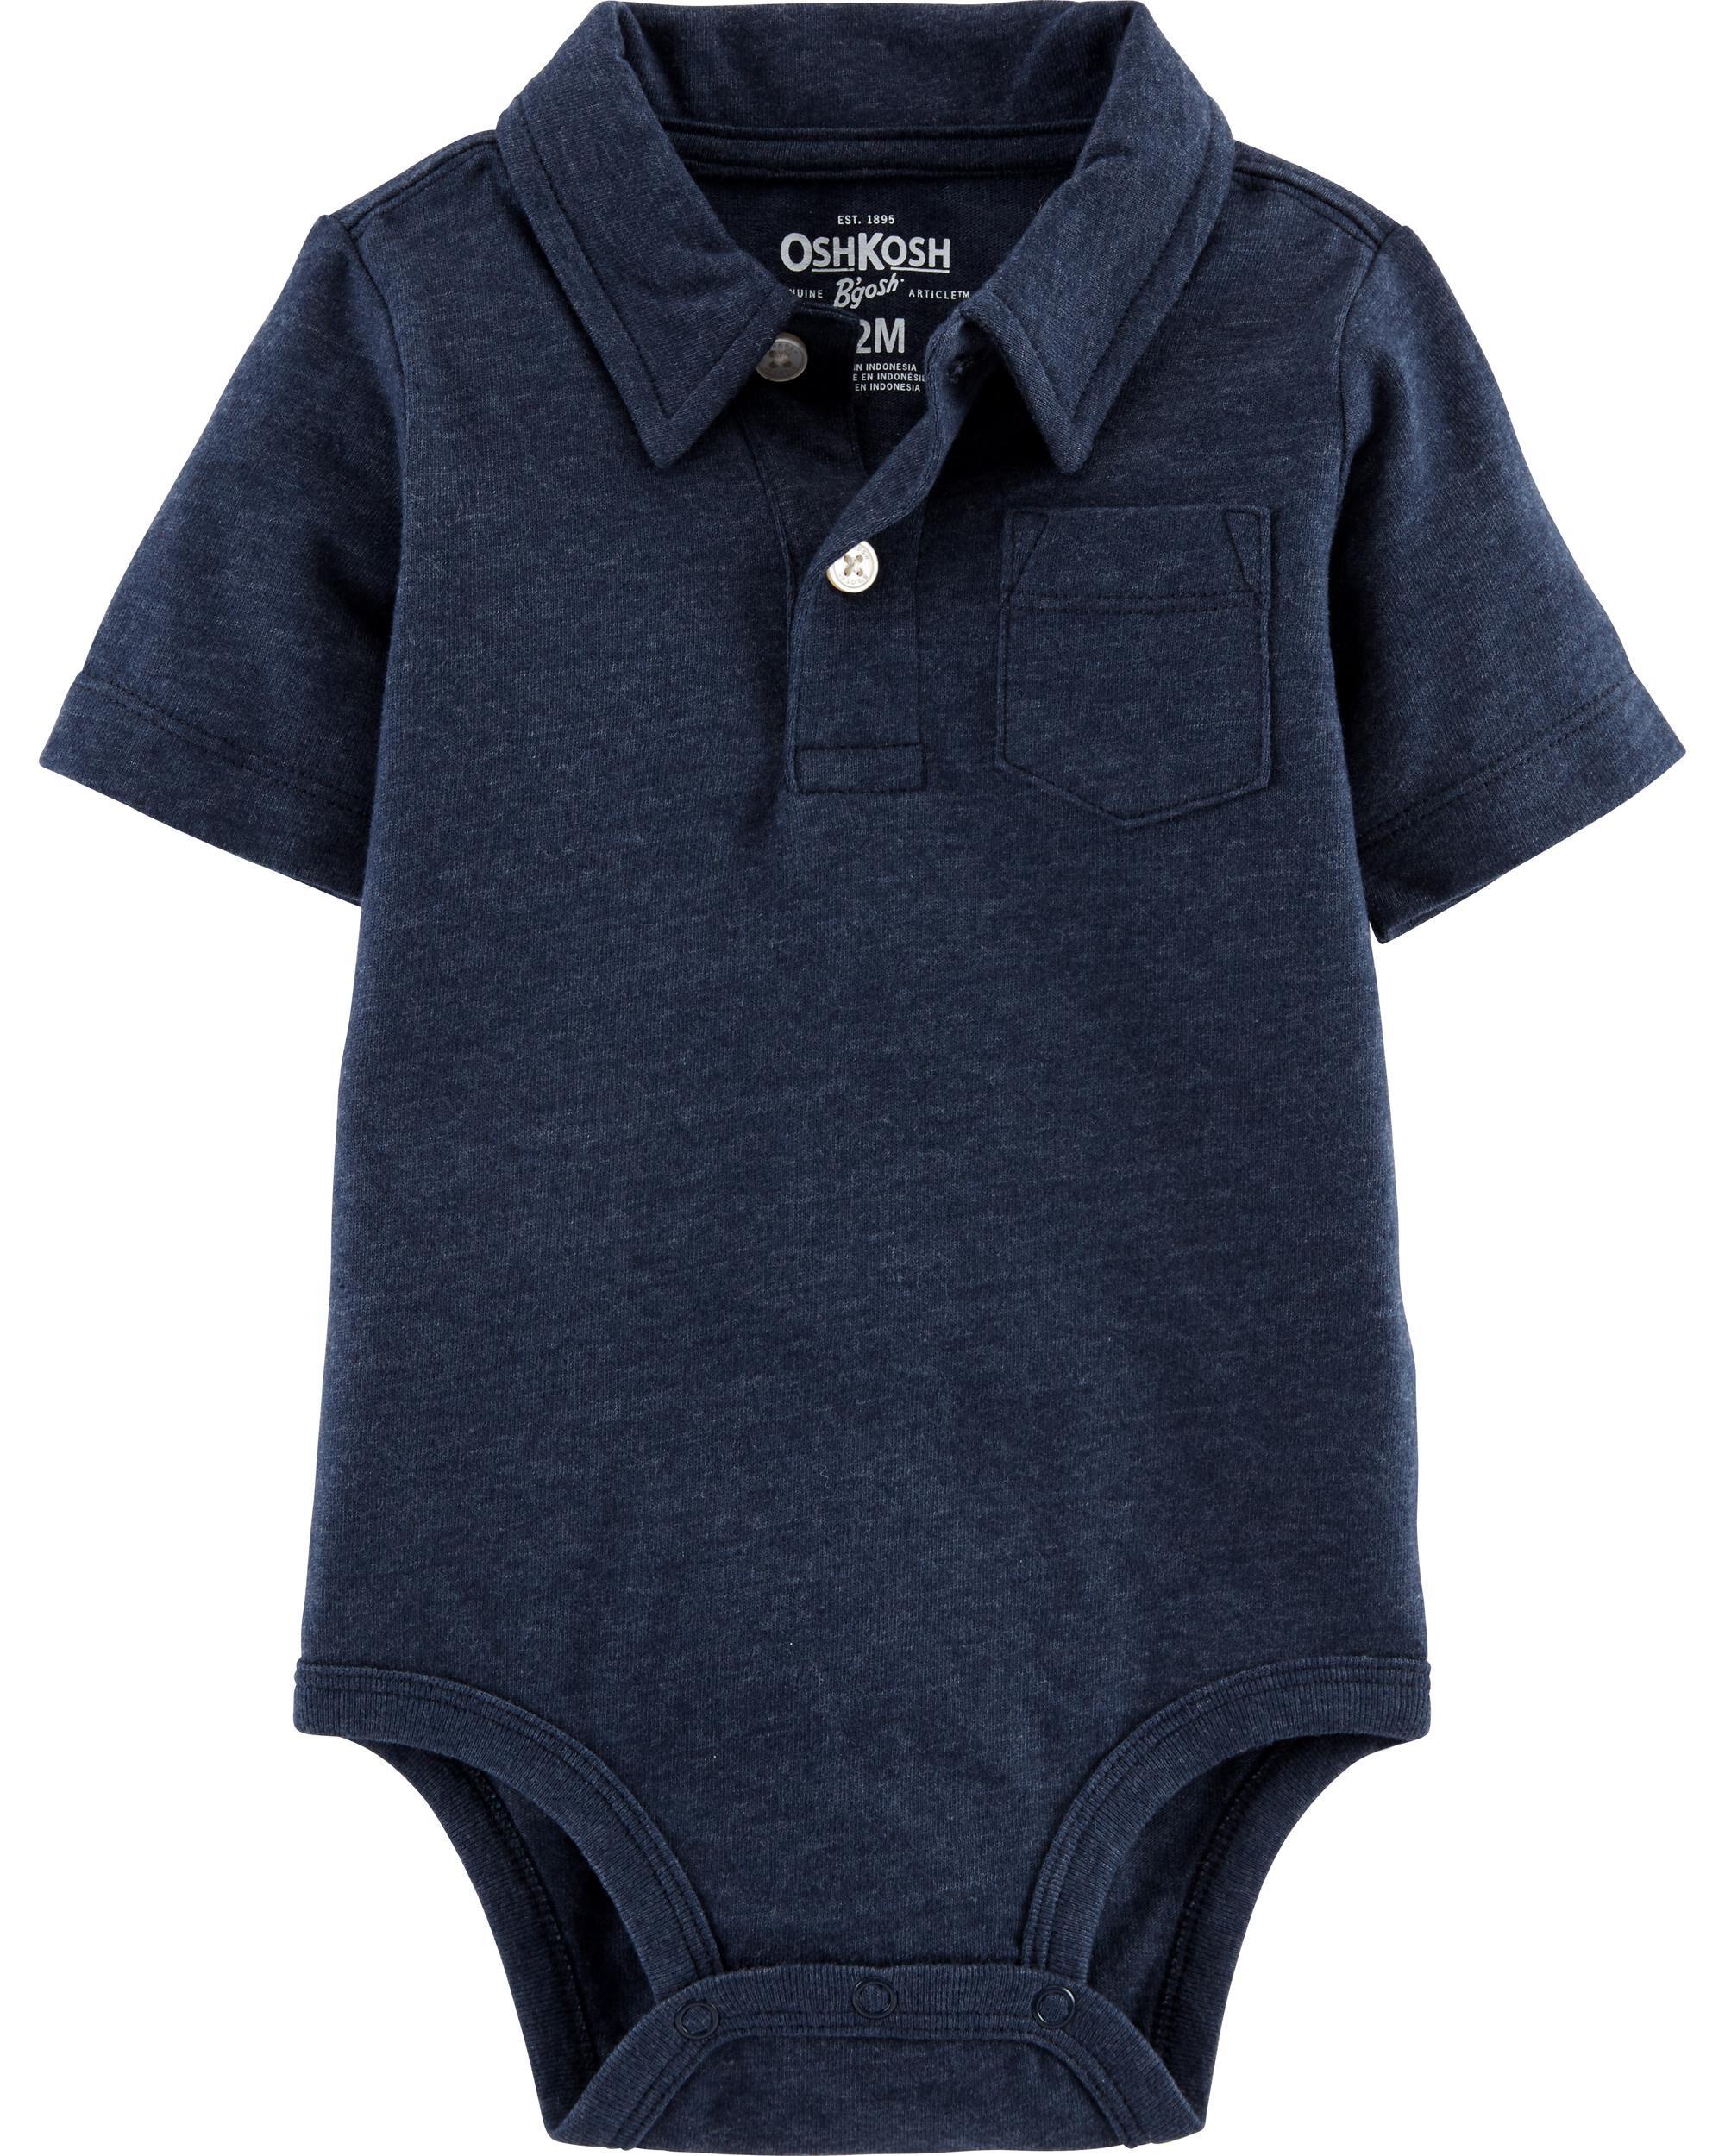 Genuine Kids Made By Oshkosh Infant//Toddler Boys Short Sleeve Polo Shirt Red